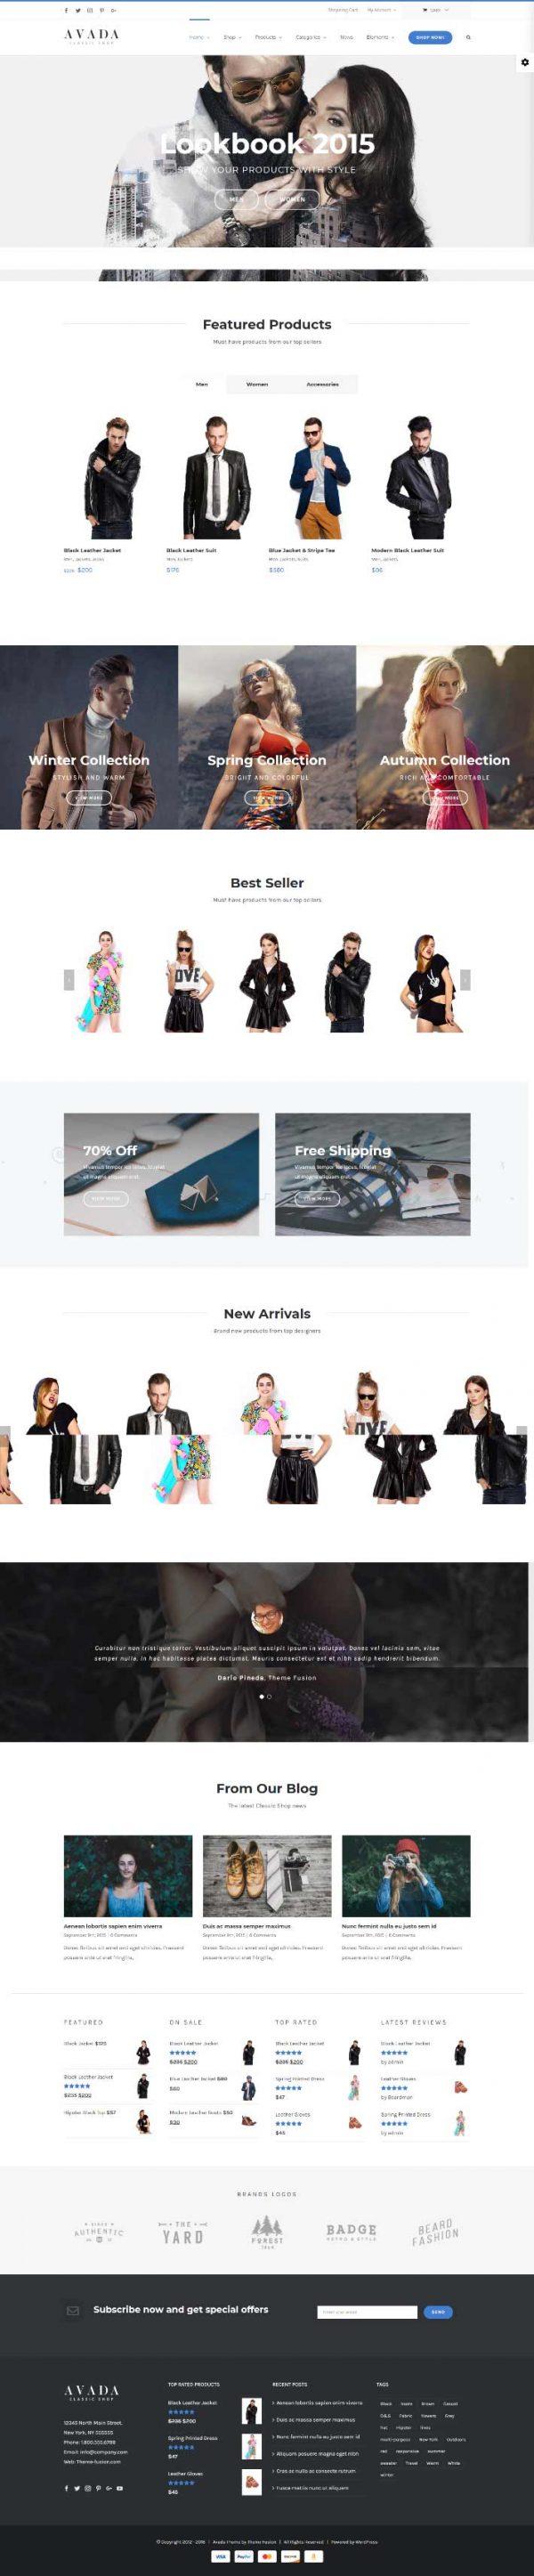 Avada-Classic-Shop